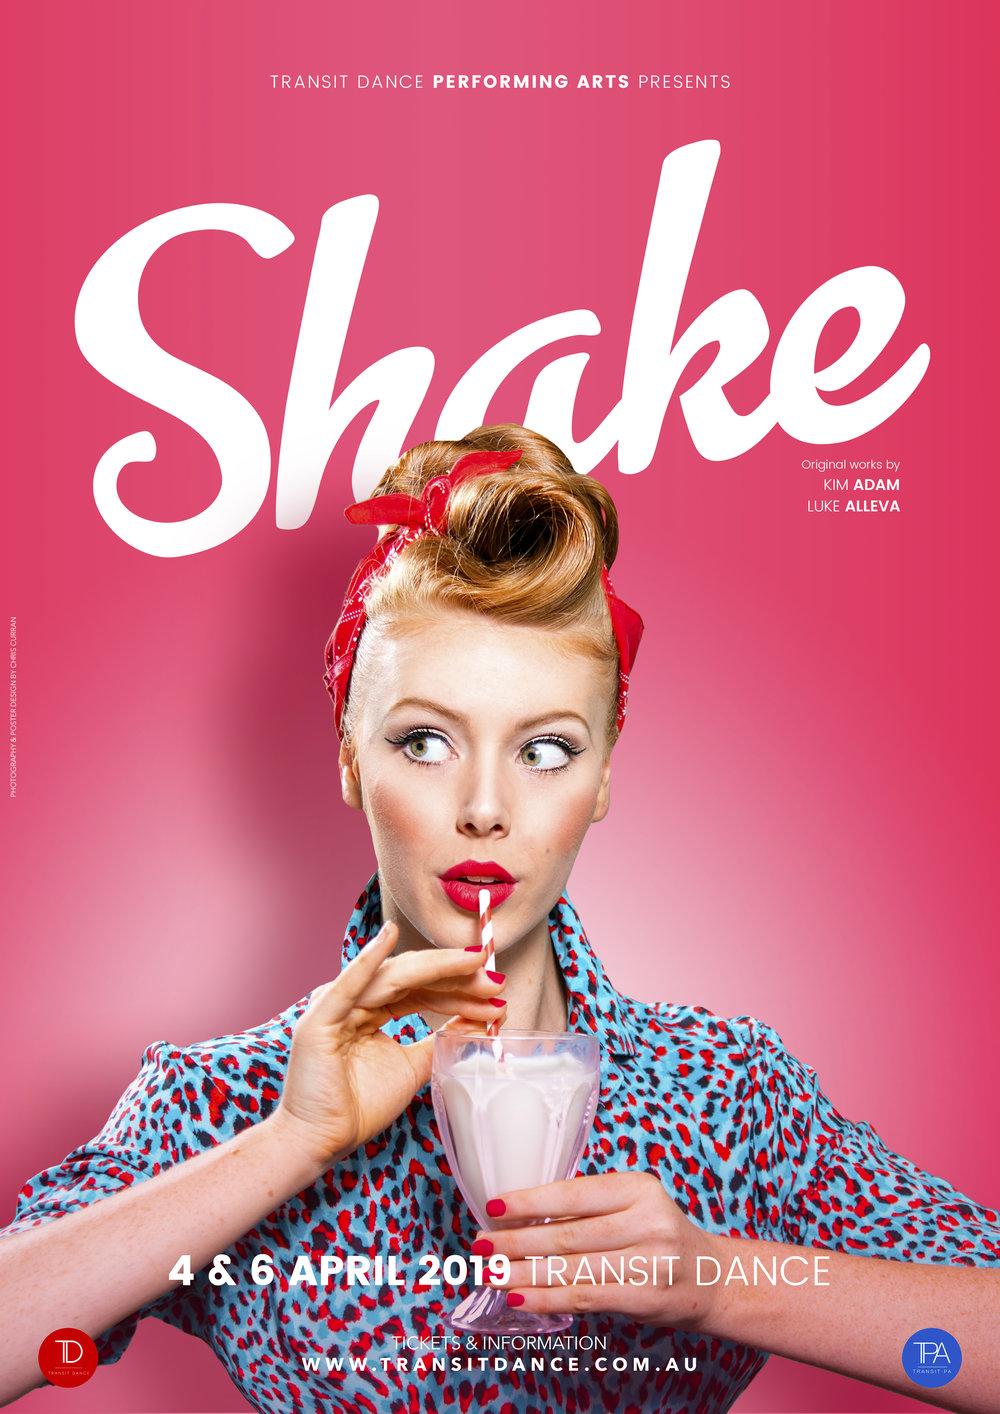 Shake poster a3.jpg